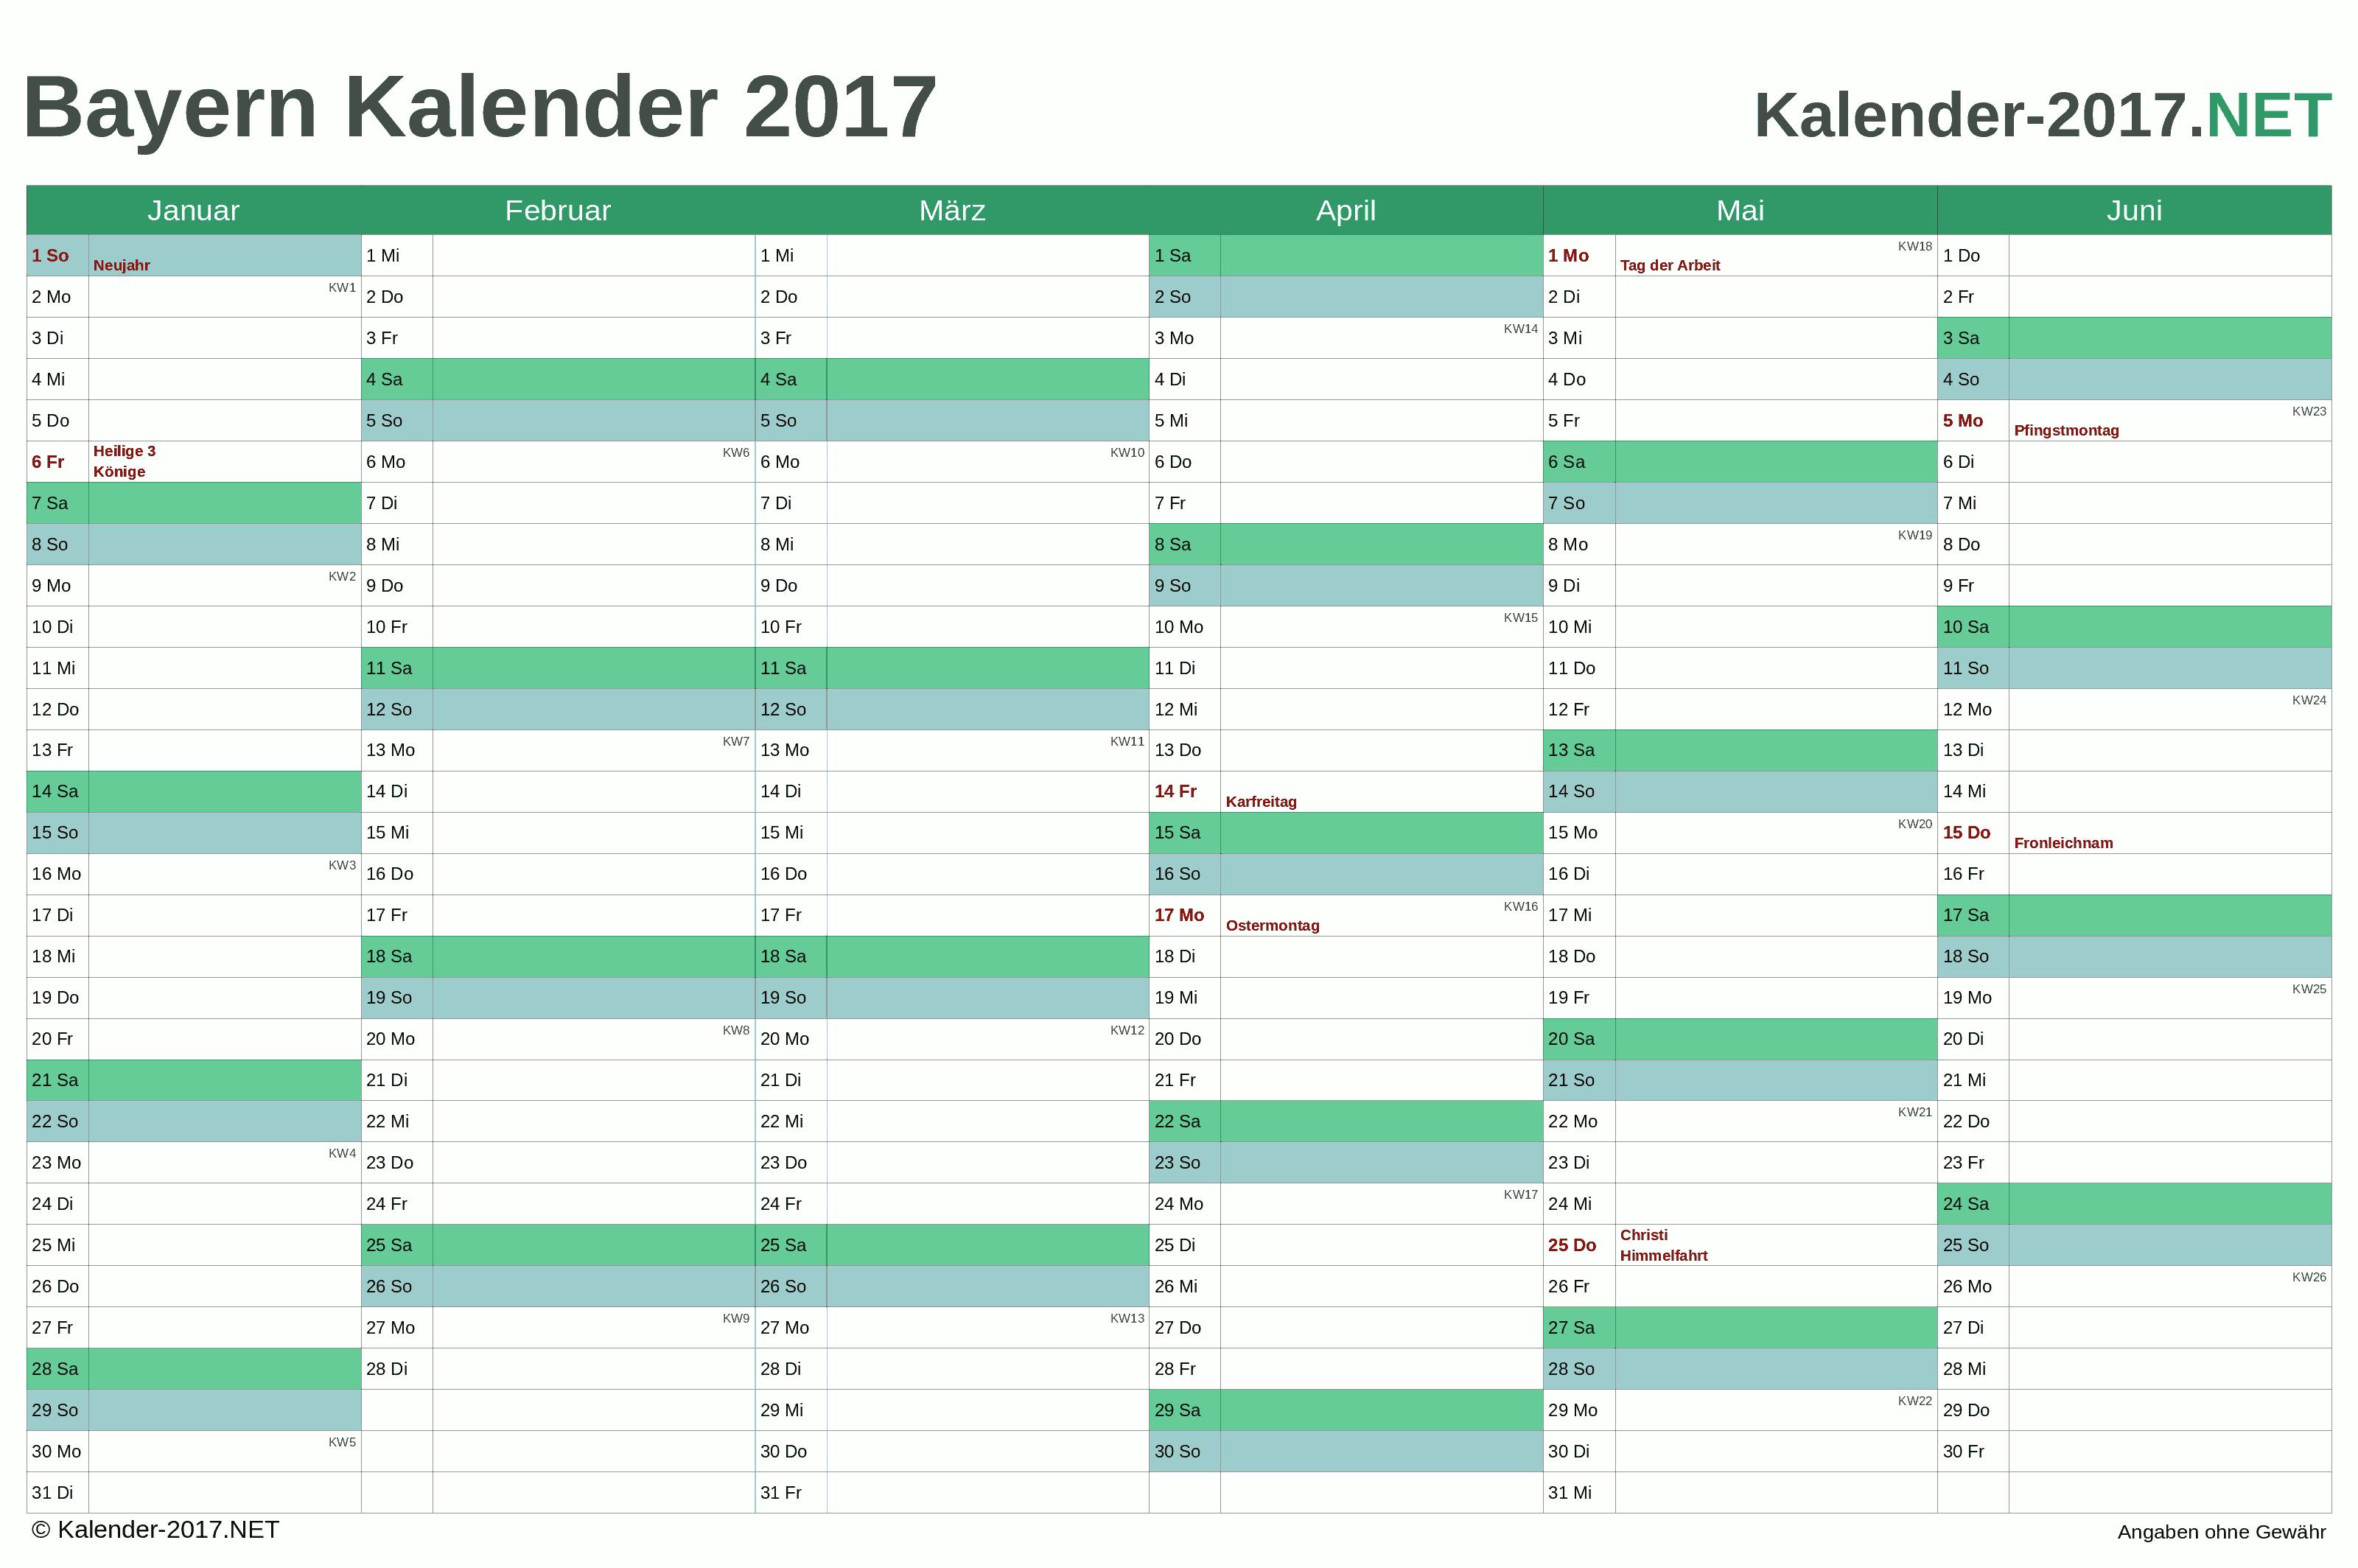 bayern-kalender-2017-2s.png